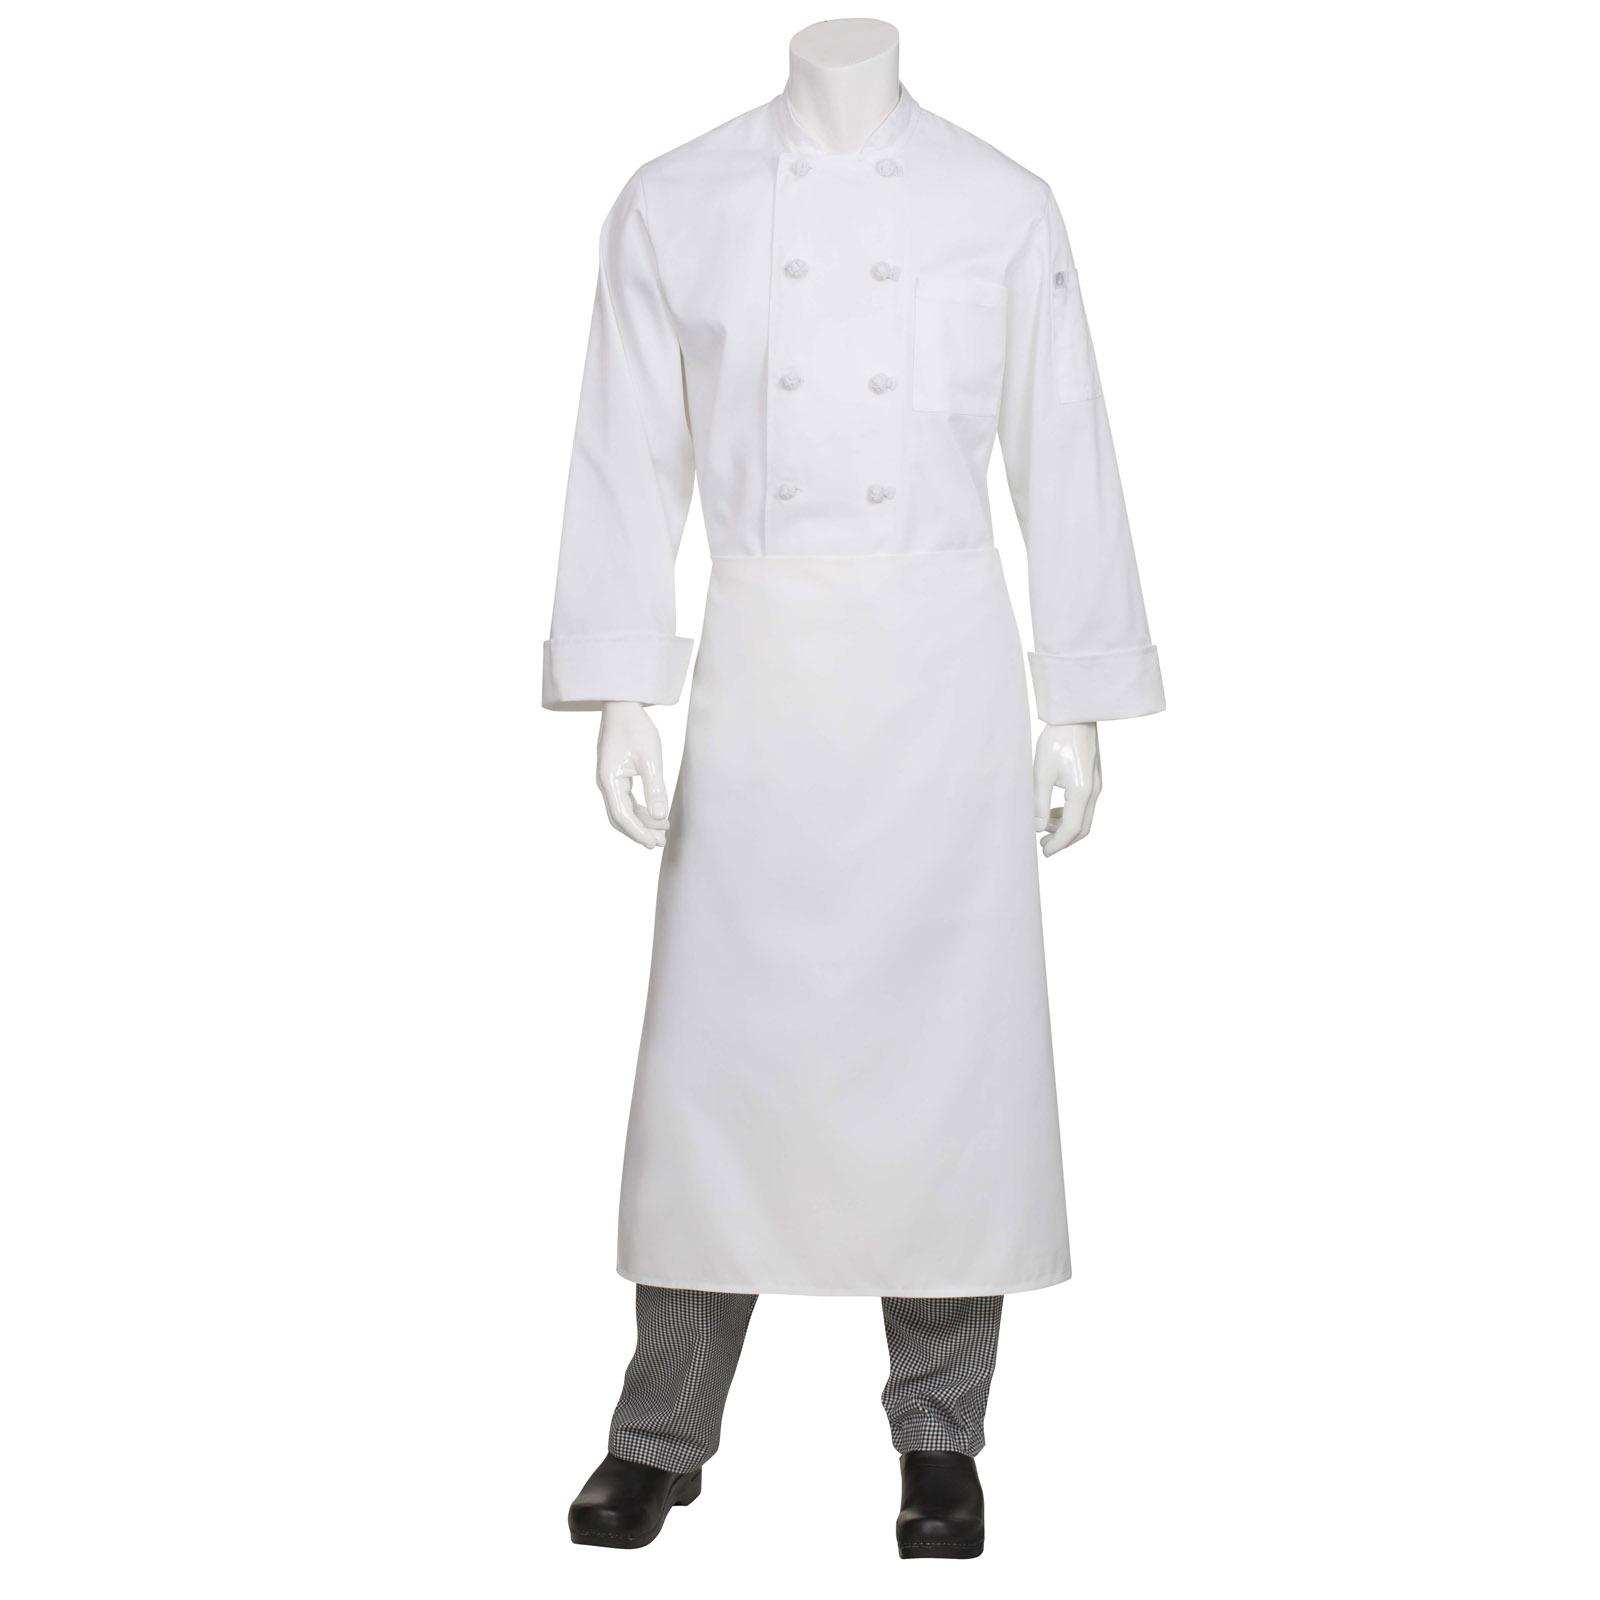 Chef Works CFLAWHT0 waist apron